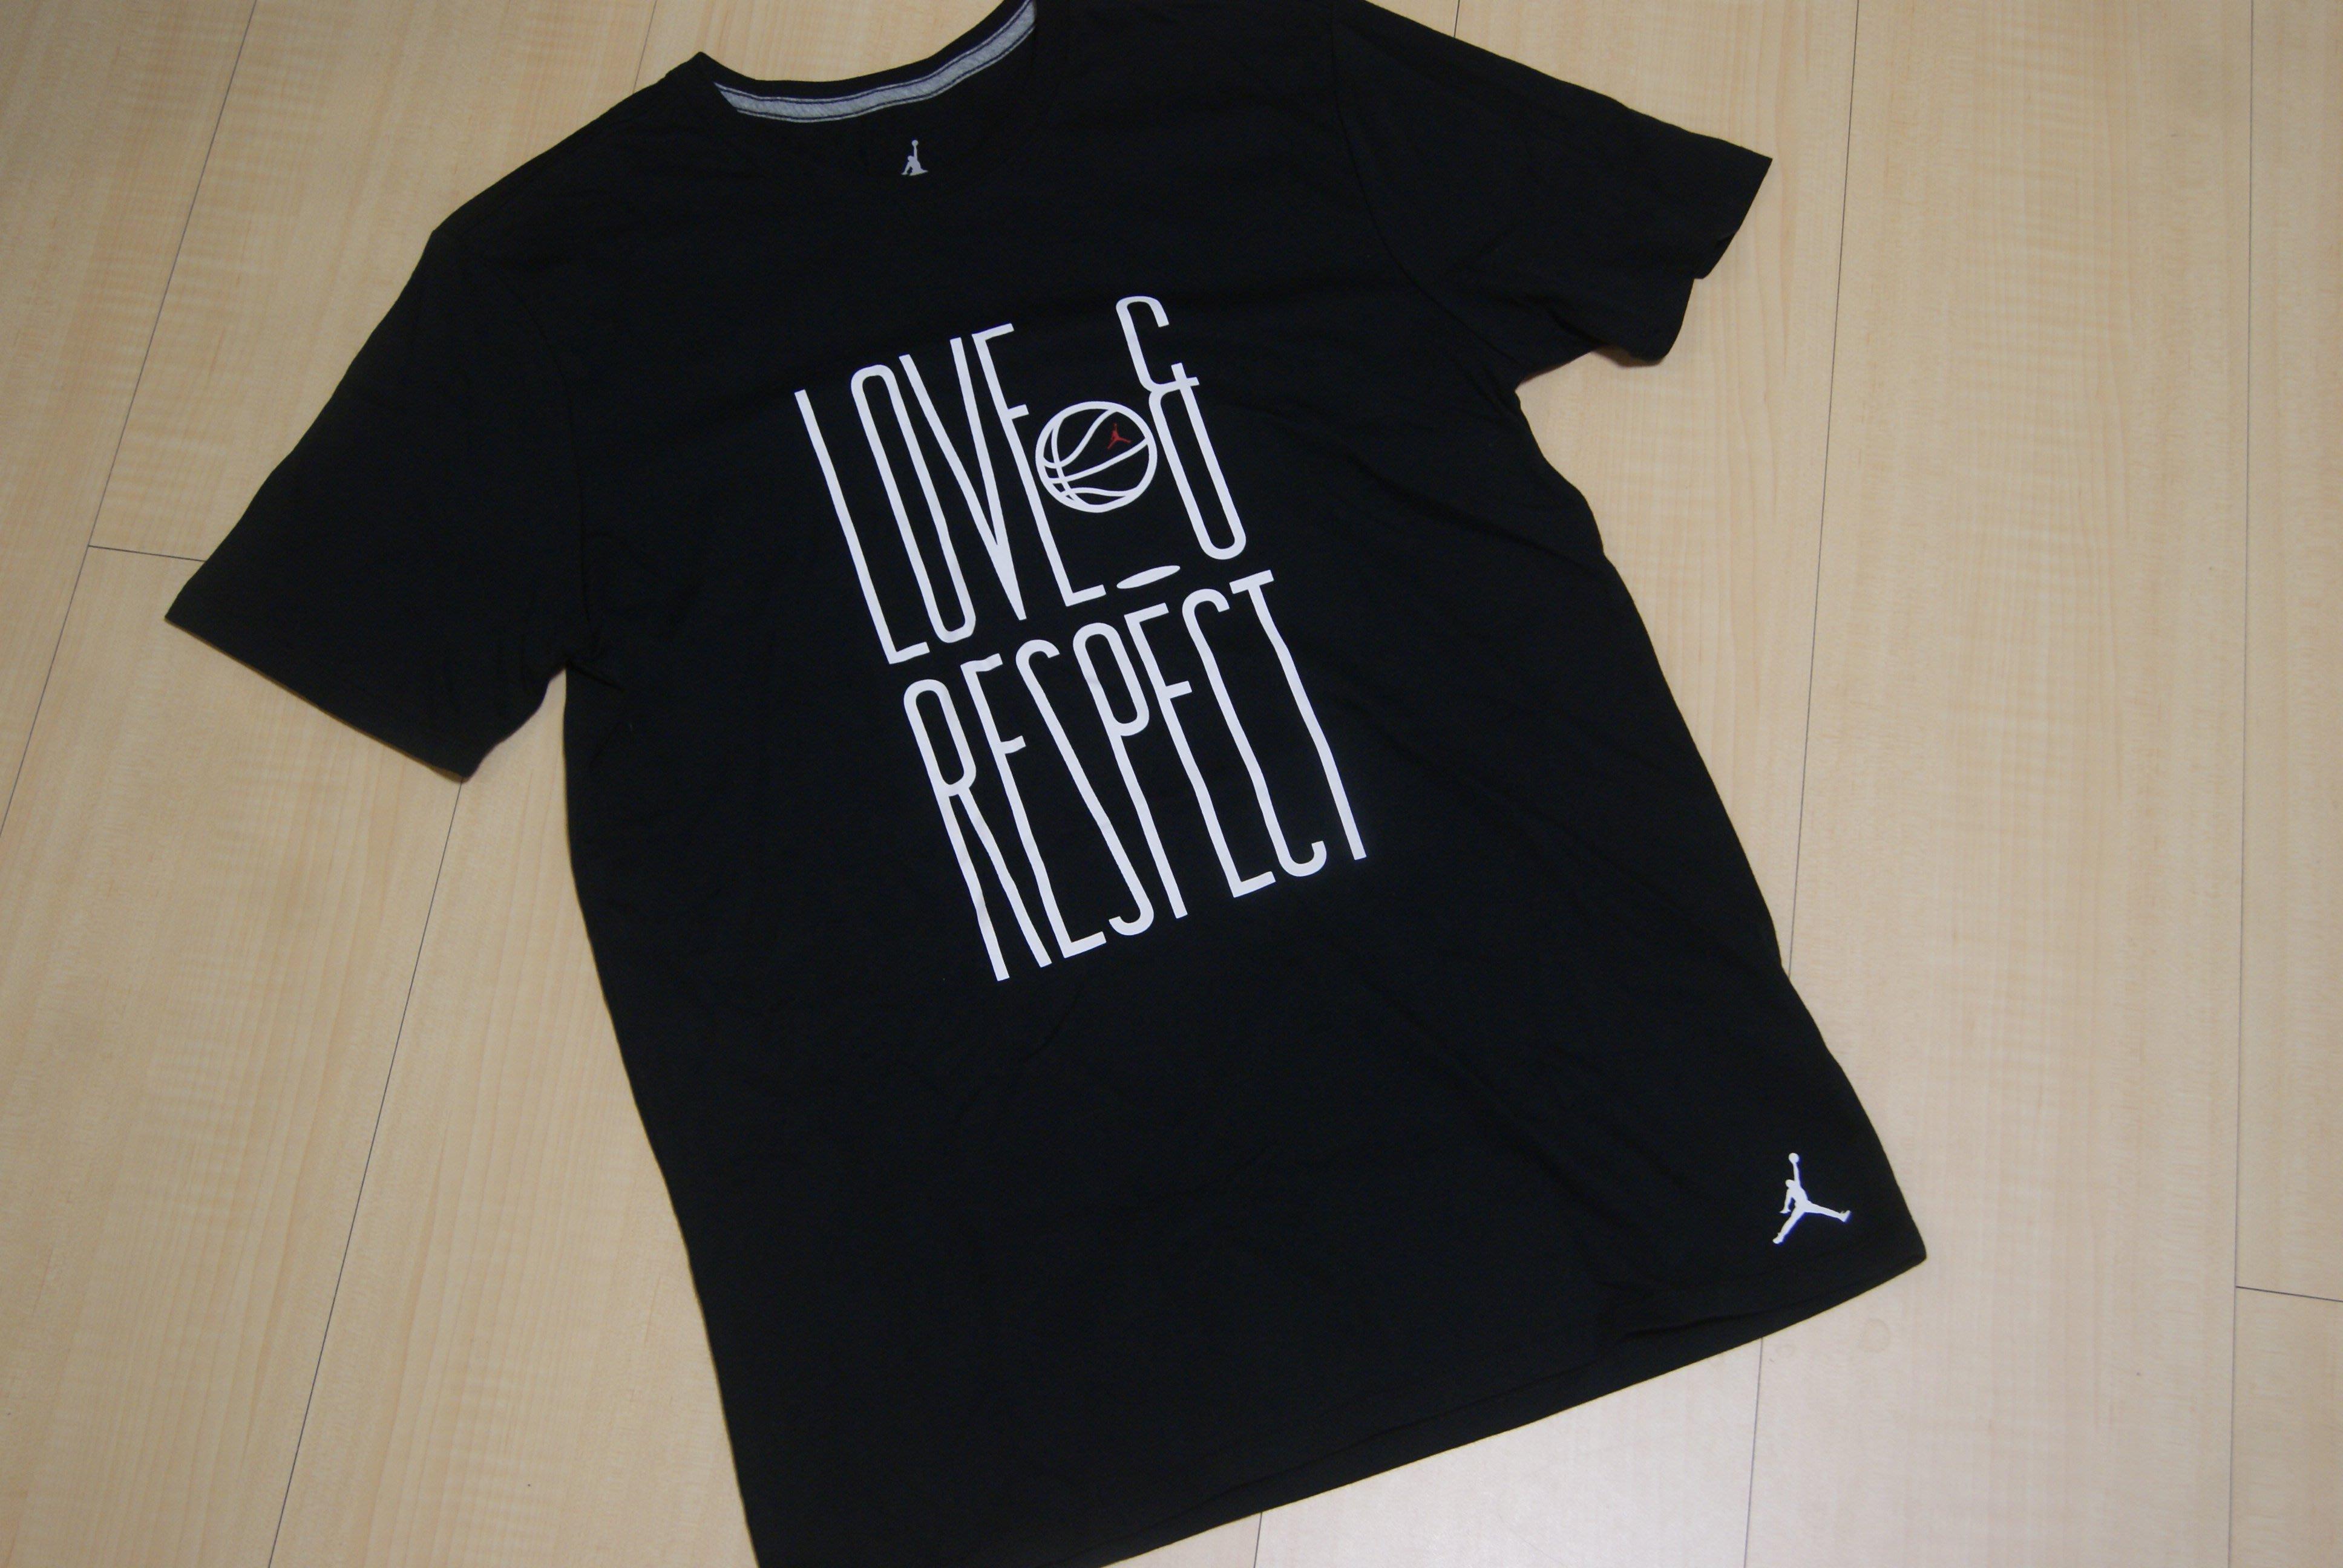 NIKE AIR JORDAN LOVE & RESPECT 愛與敬意 短T恤短TEE 短袖針織衫 AQ4891-010